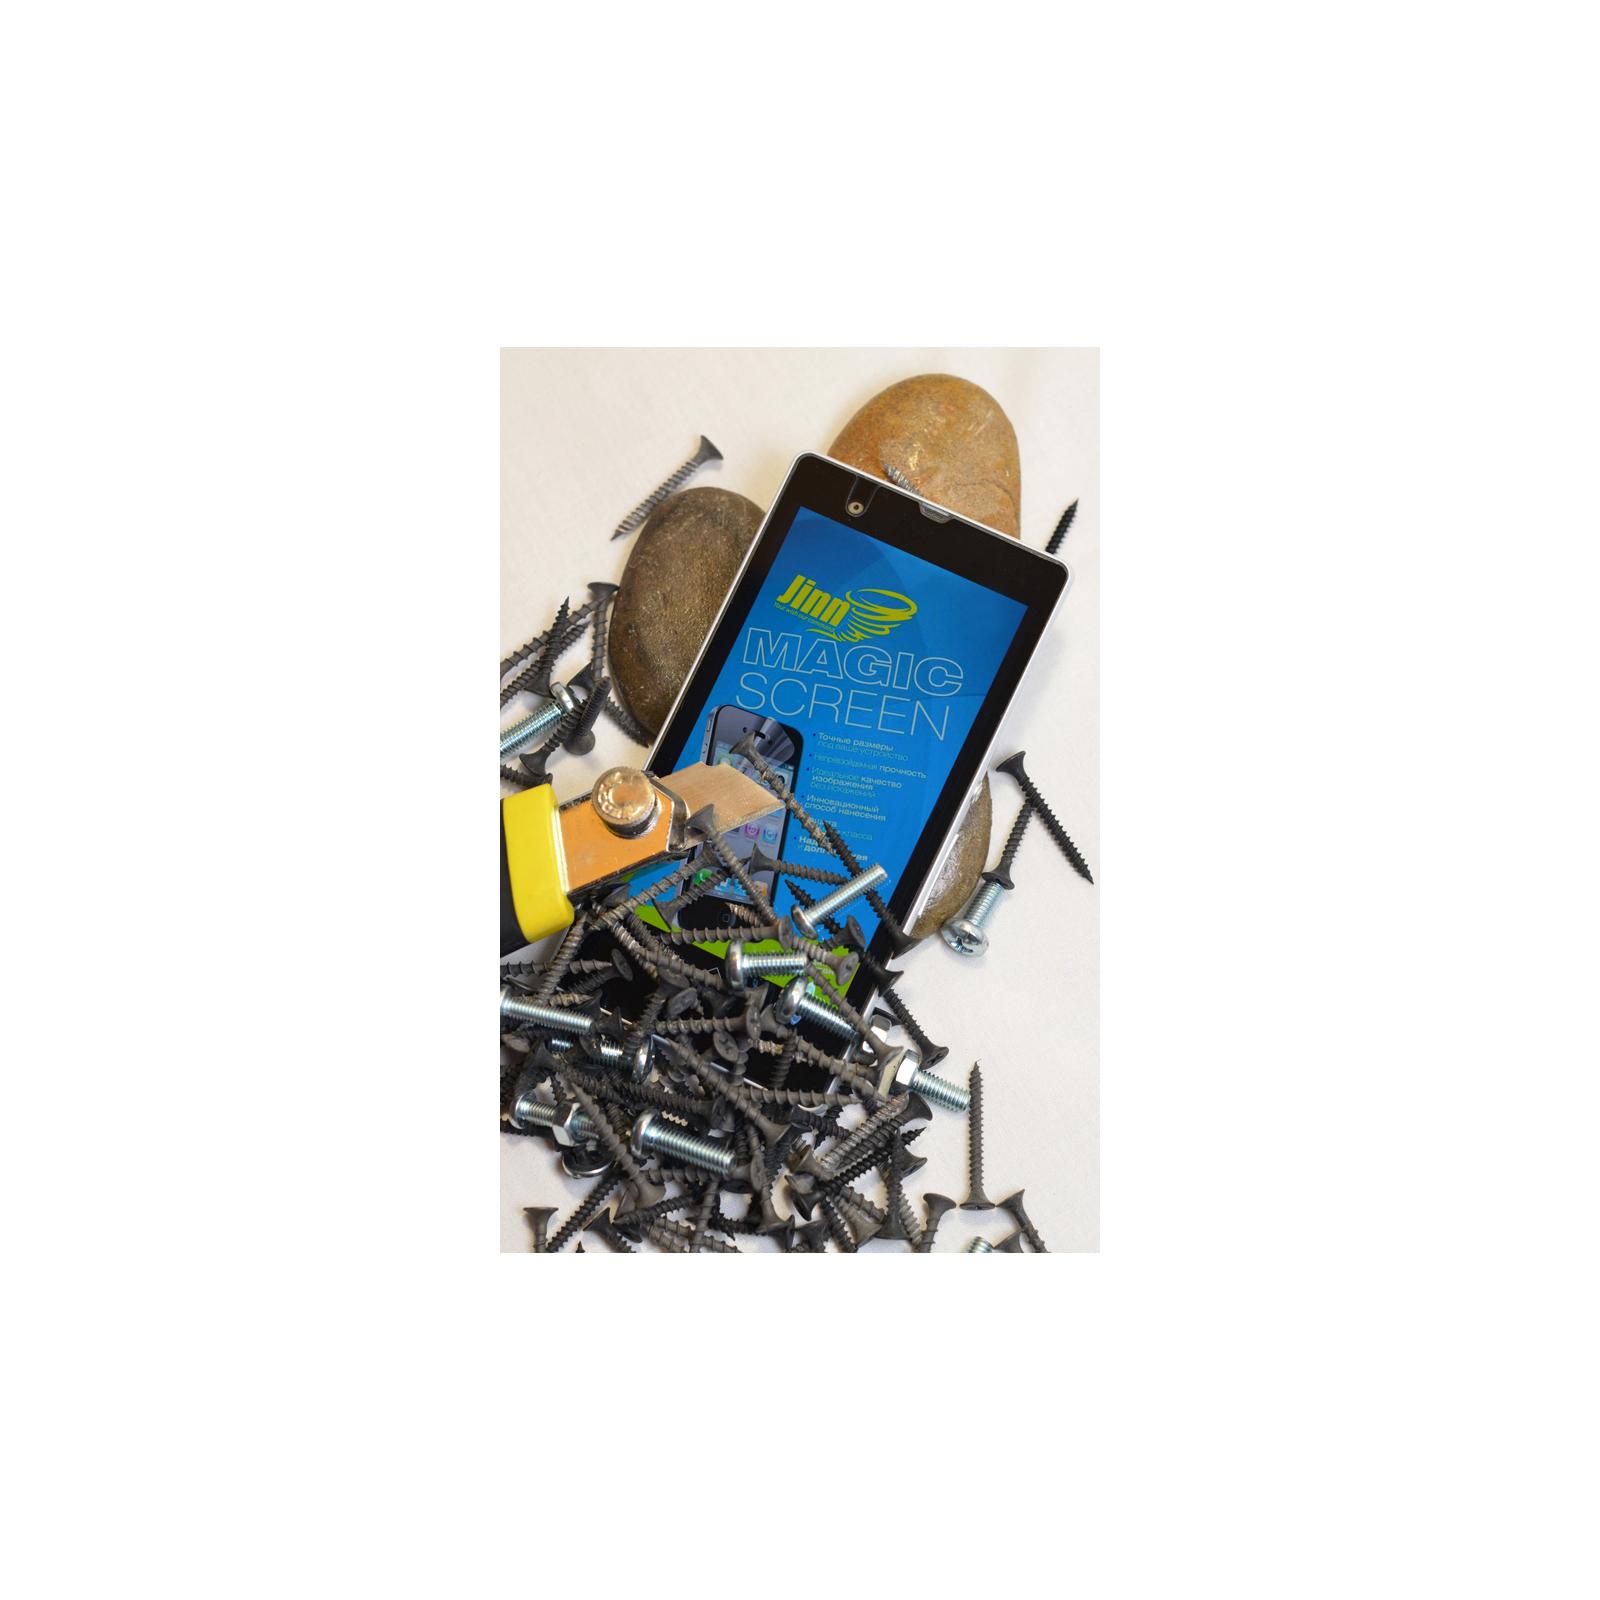 Пленка защитная JINN ультрапрочная Magic Screen для Lenovo Ideaphone S890 (LenovoIdeaphone S890 front+back) изображение 2